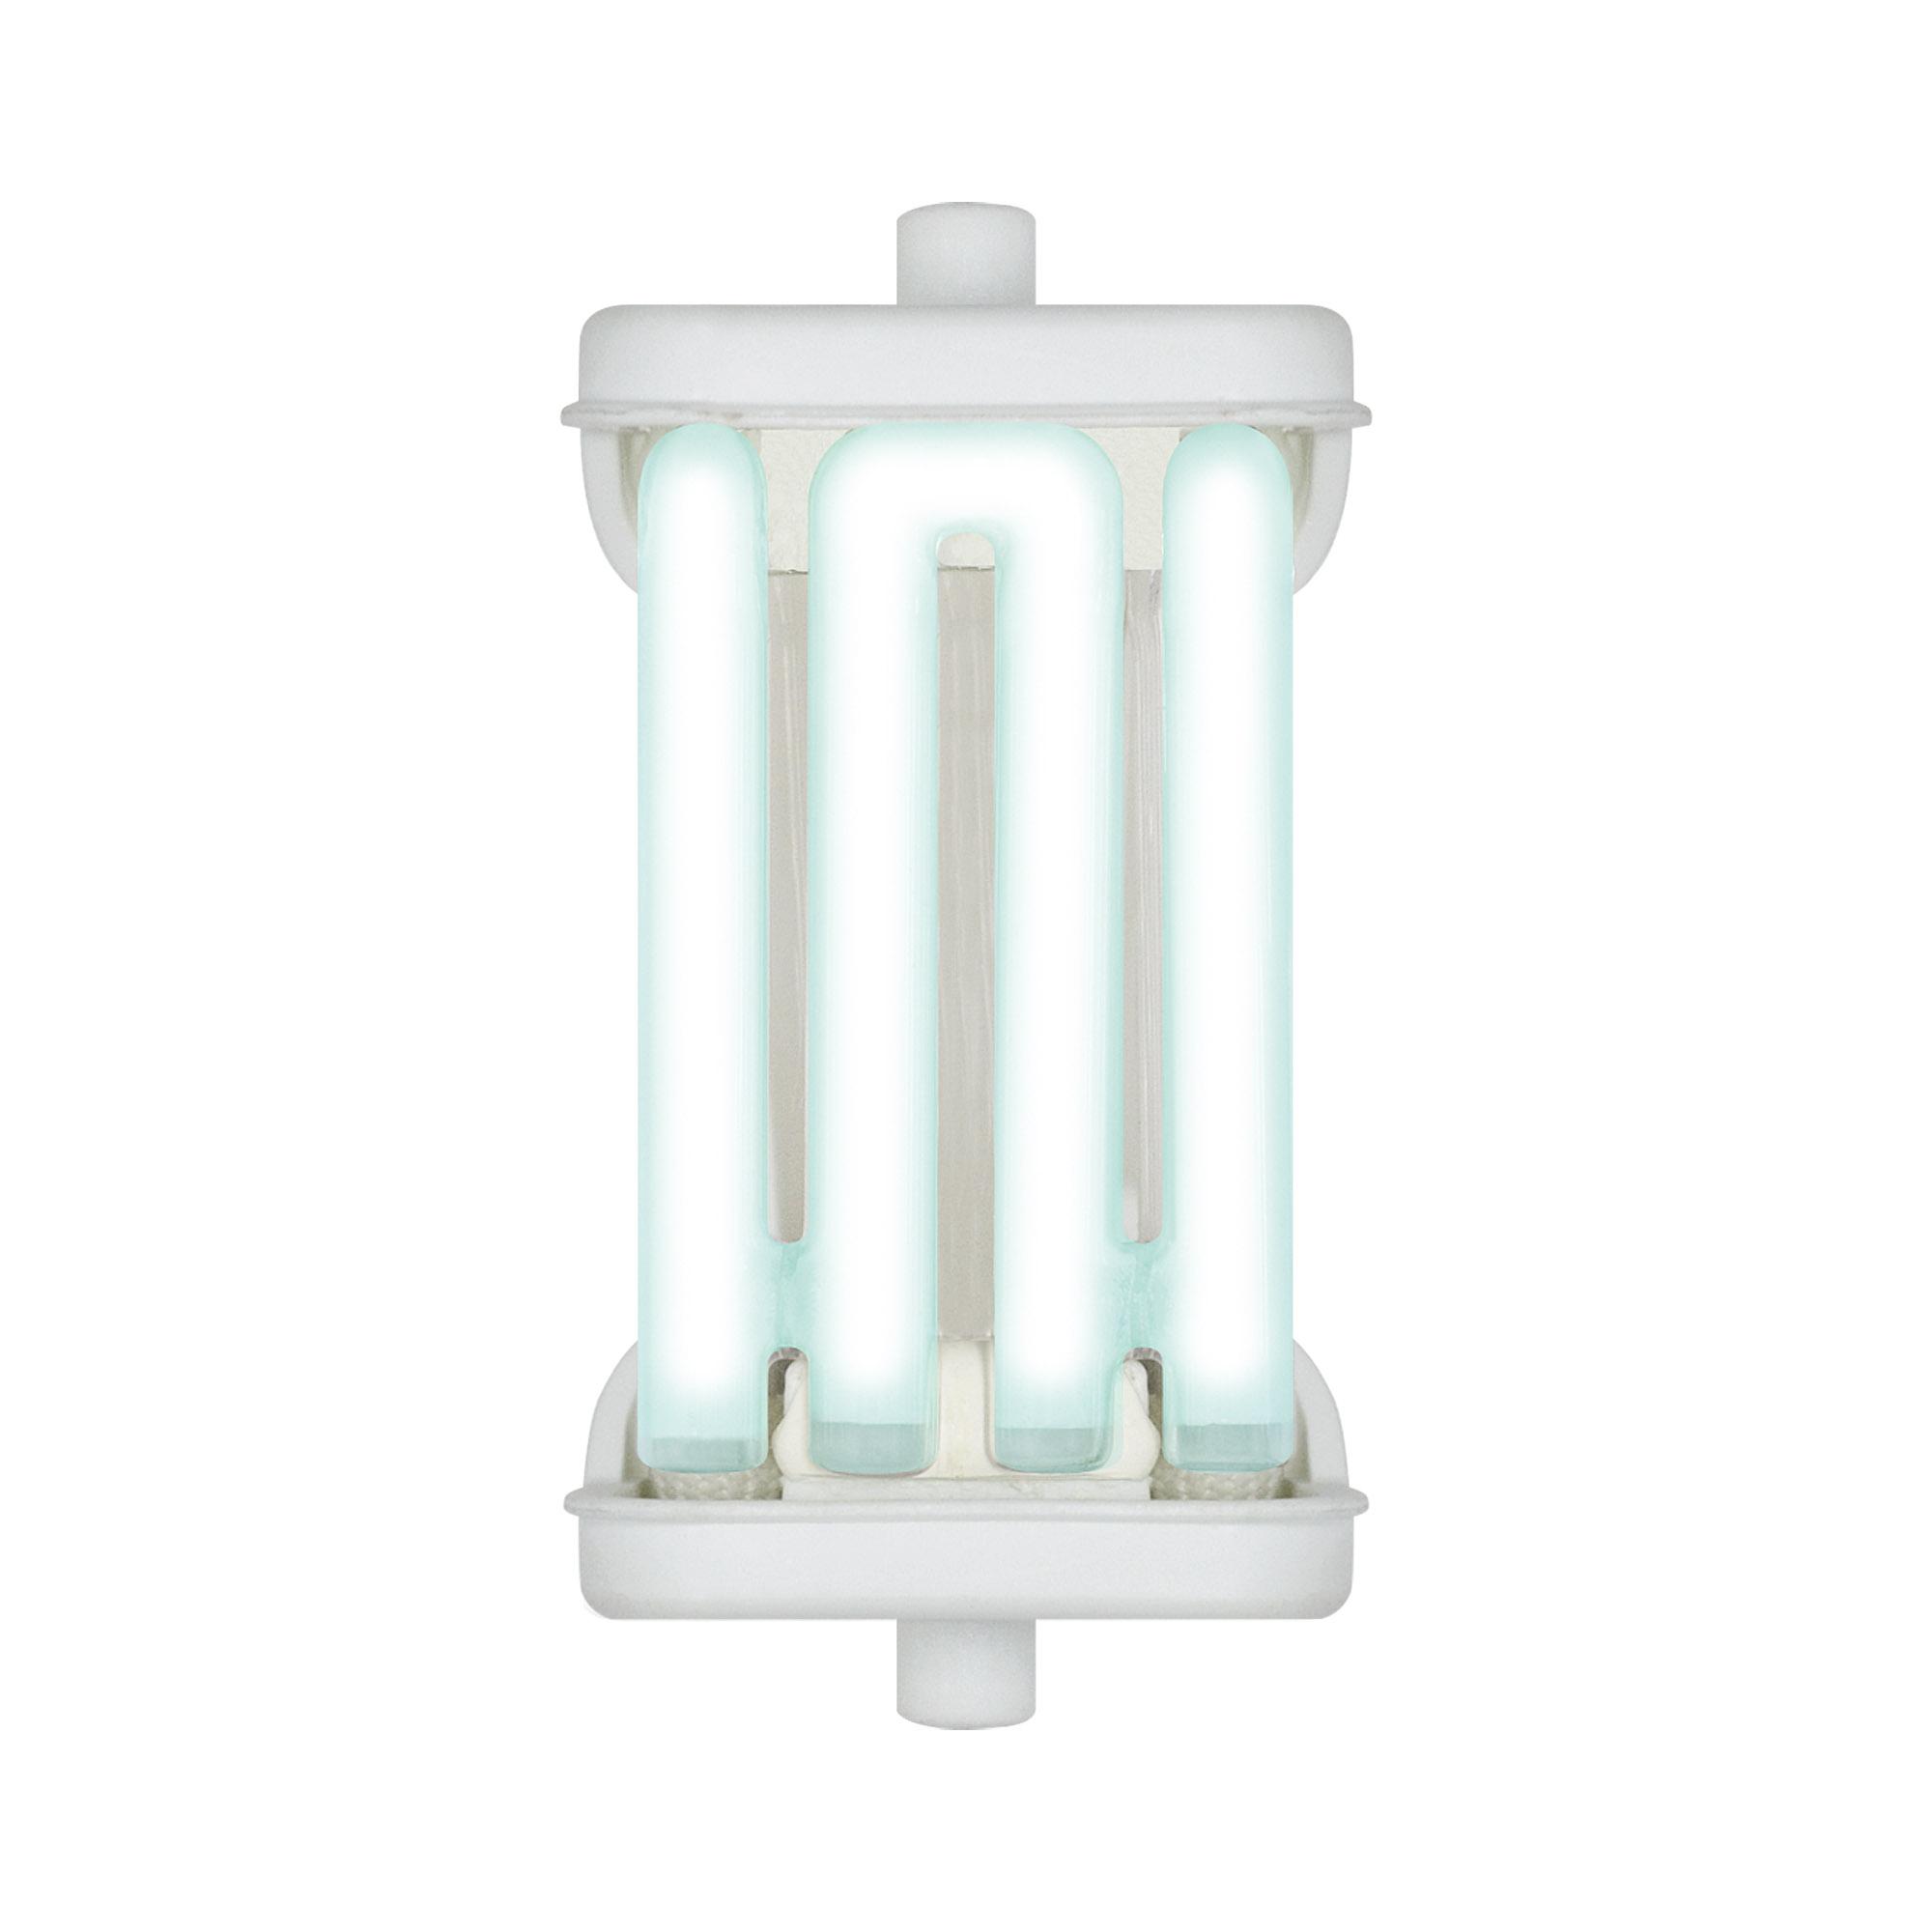 Фото. Лампа энергосберегающая Uniel Esl-322-j78-13/4000/r7s 100шт